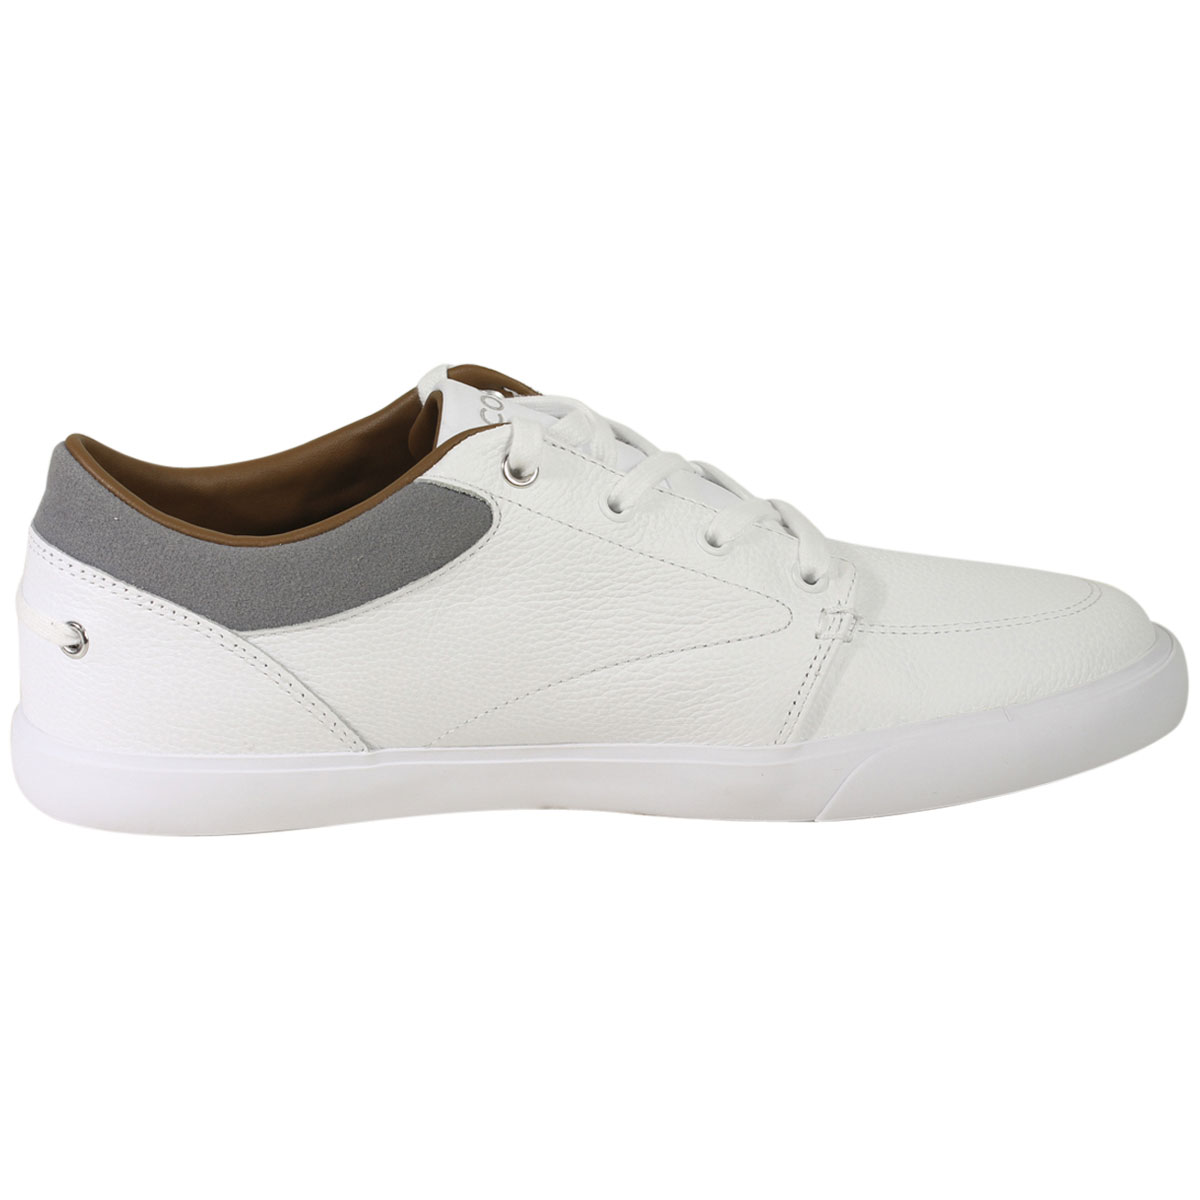 Lacoste-Men-039-s-Bayliss-118-Sneakers-Shoes thumbnail 18